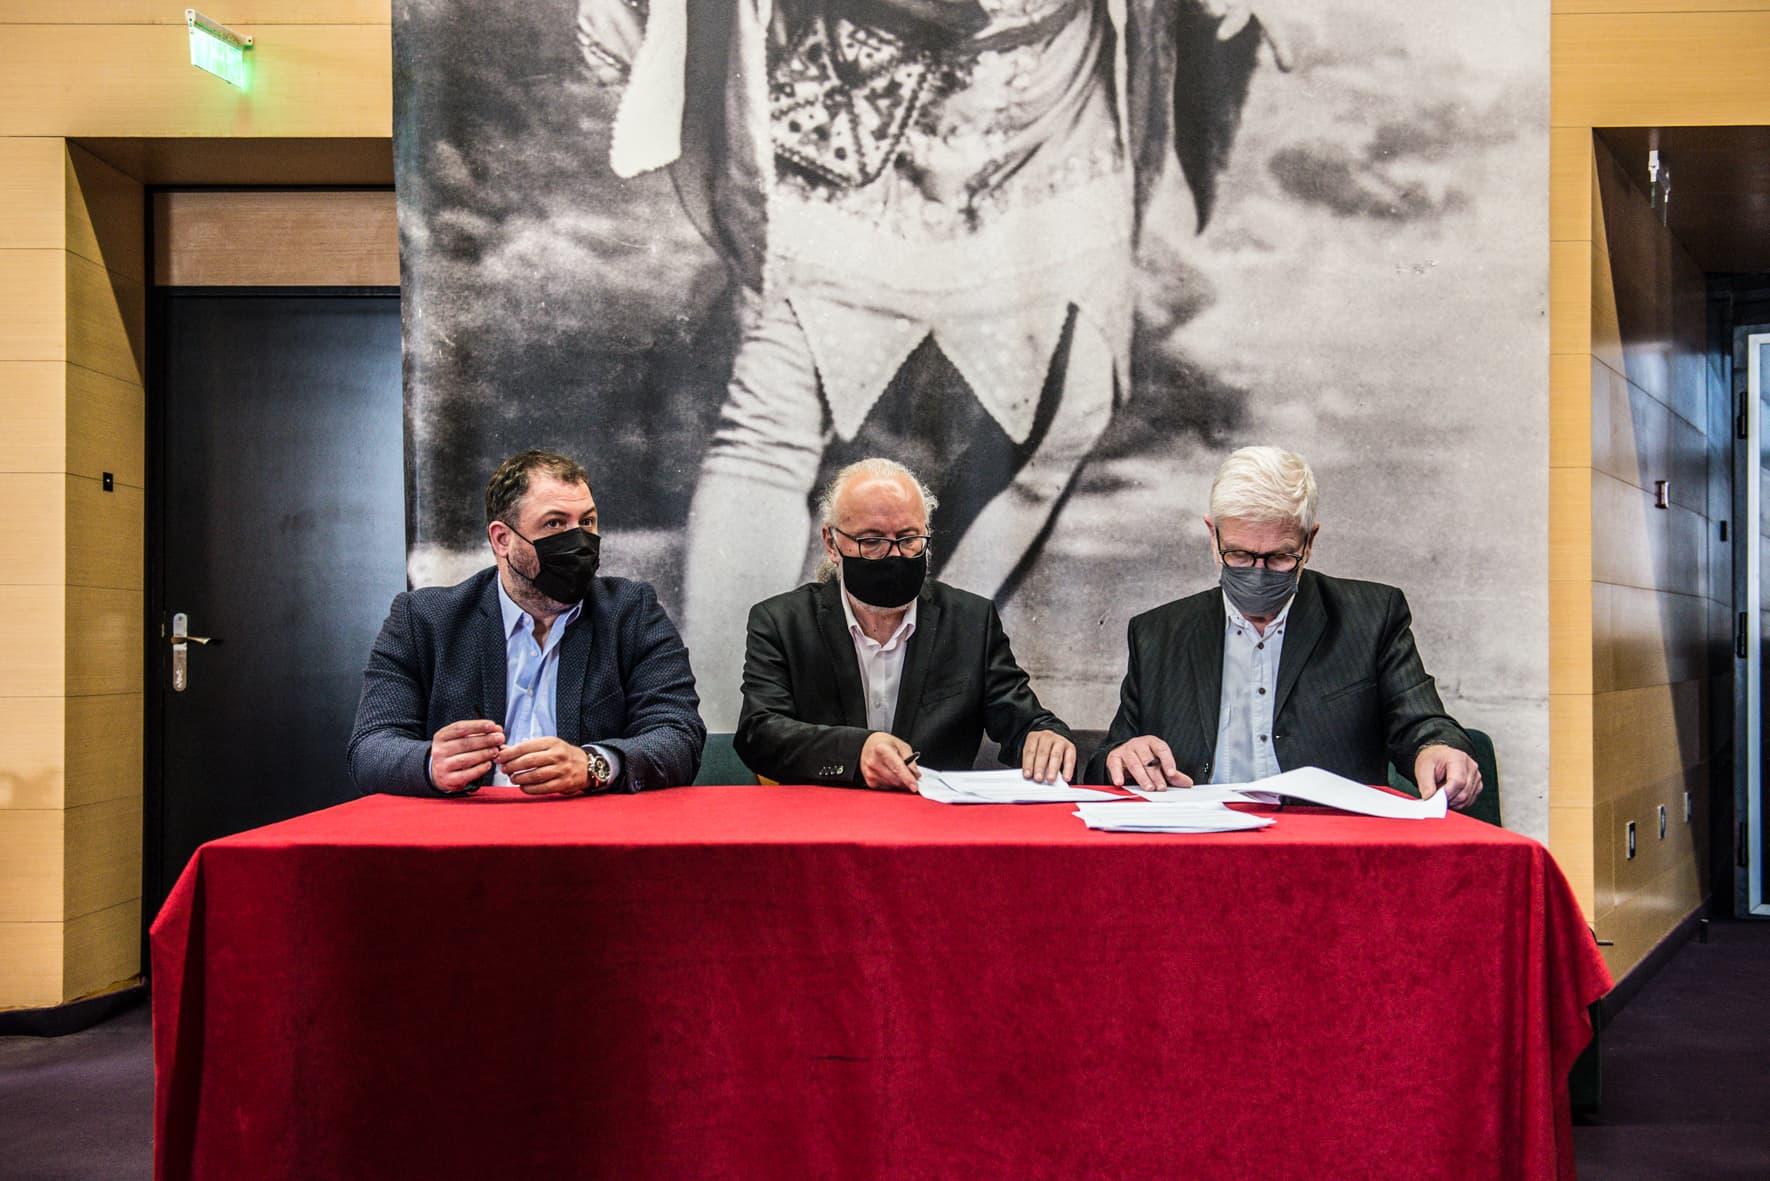 Potpisivanje sporazuma BDP SNP Novosadsko  foto D. Petrovic